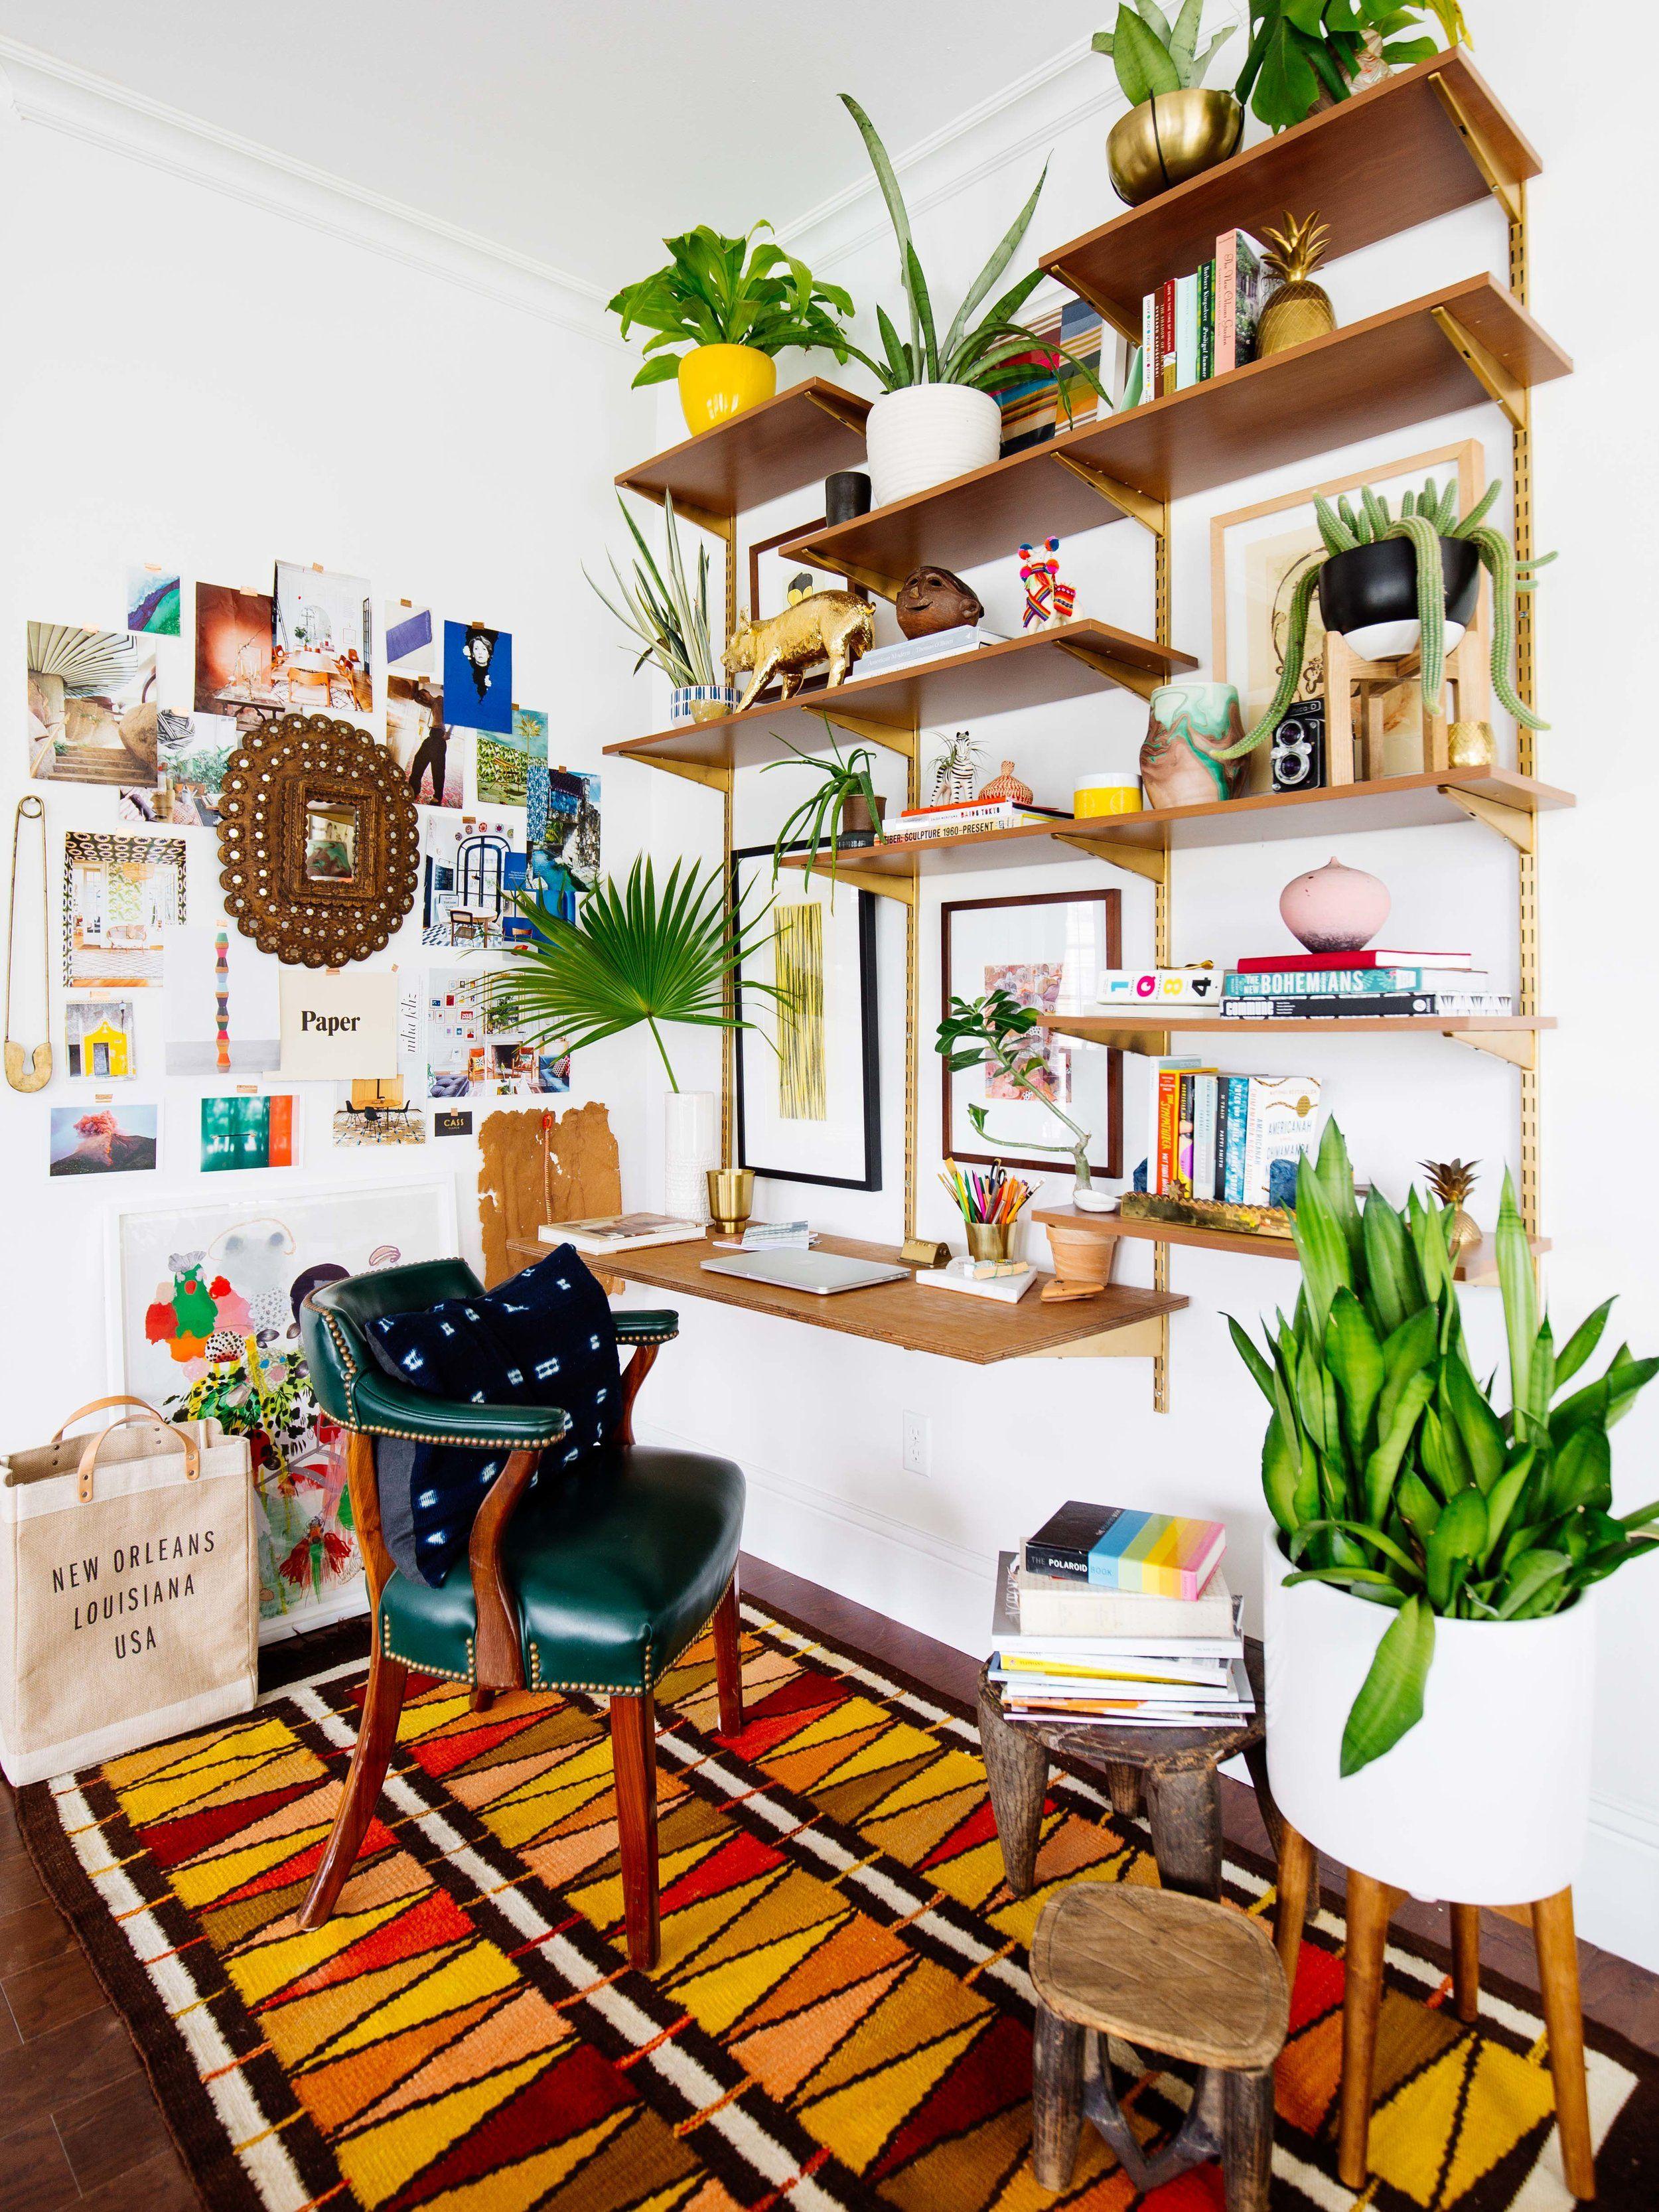 15 Small House Interior Design Ideas